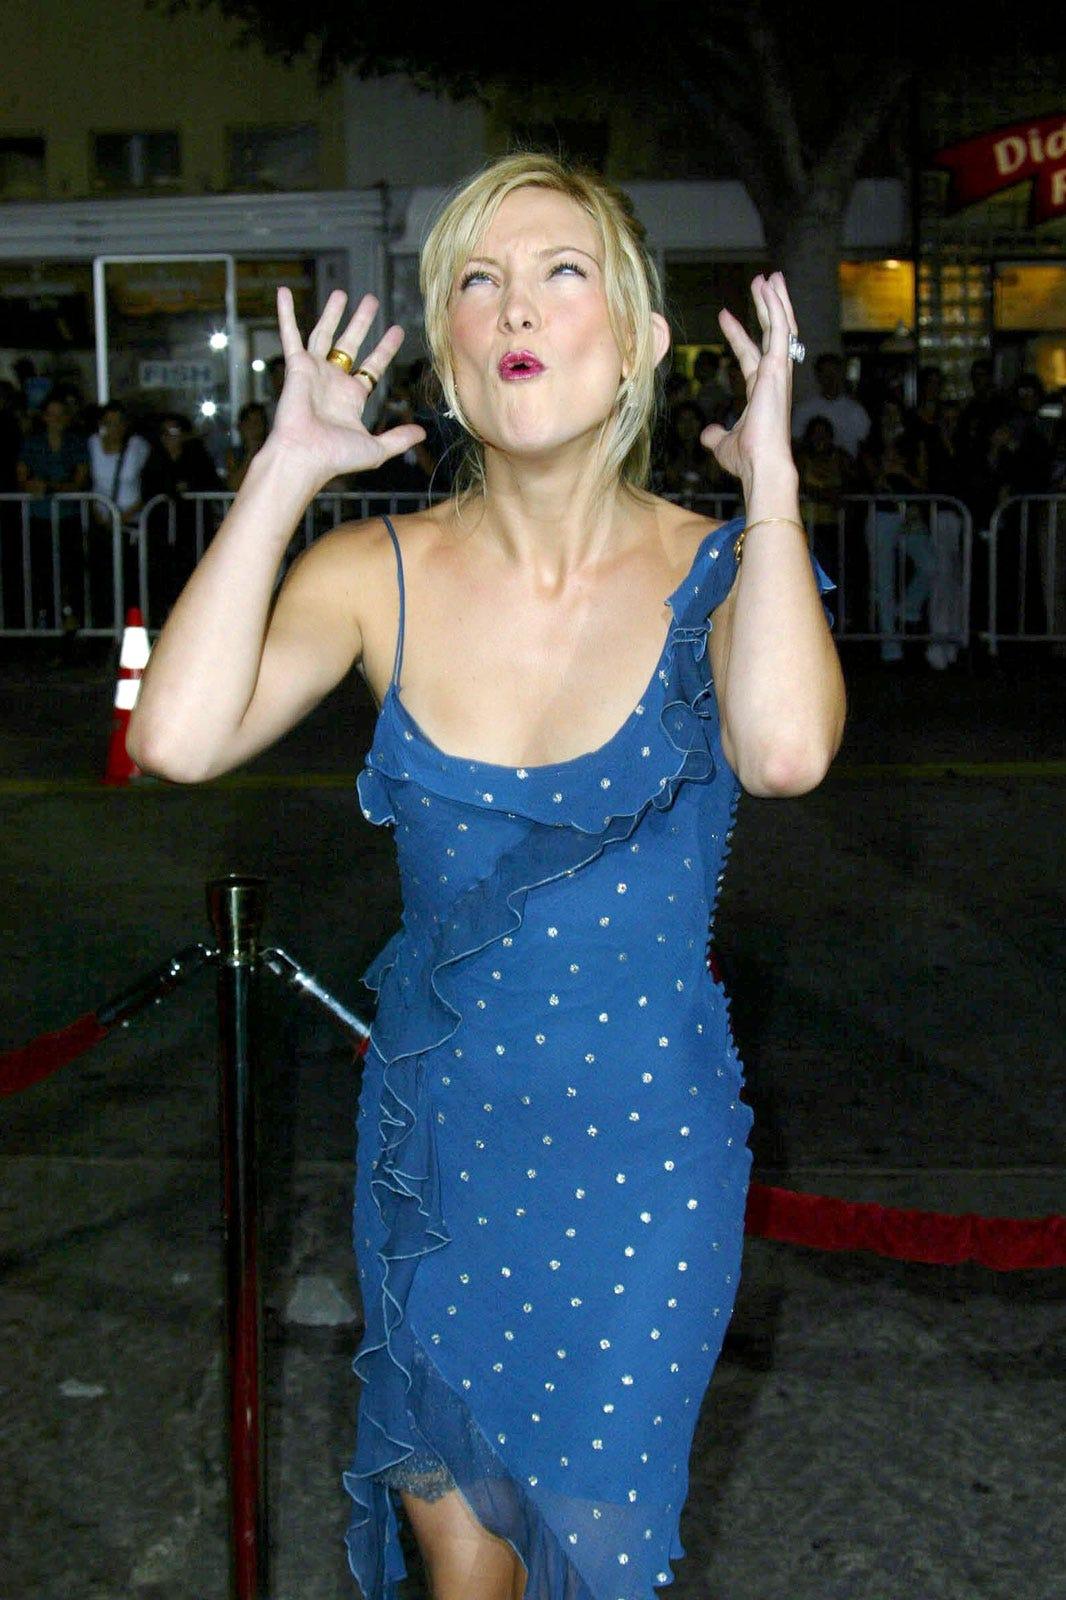 Funny Red Carpet Pics - Celebrity Wardrobe Malfunctions